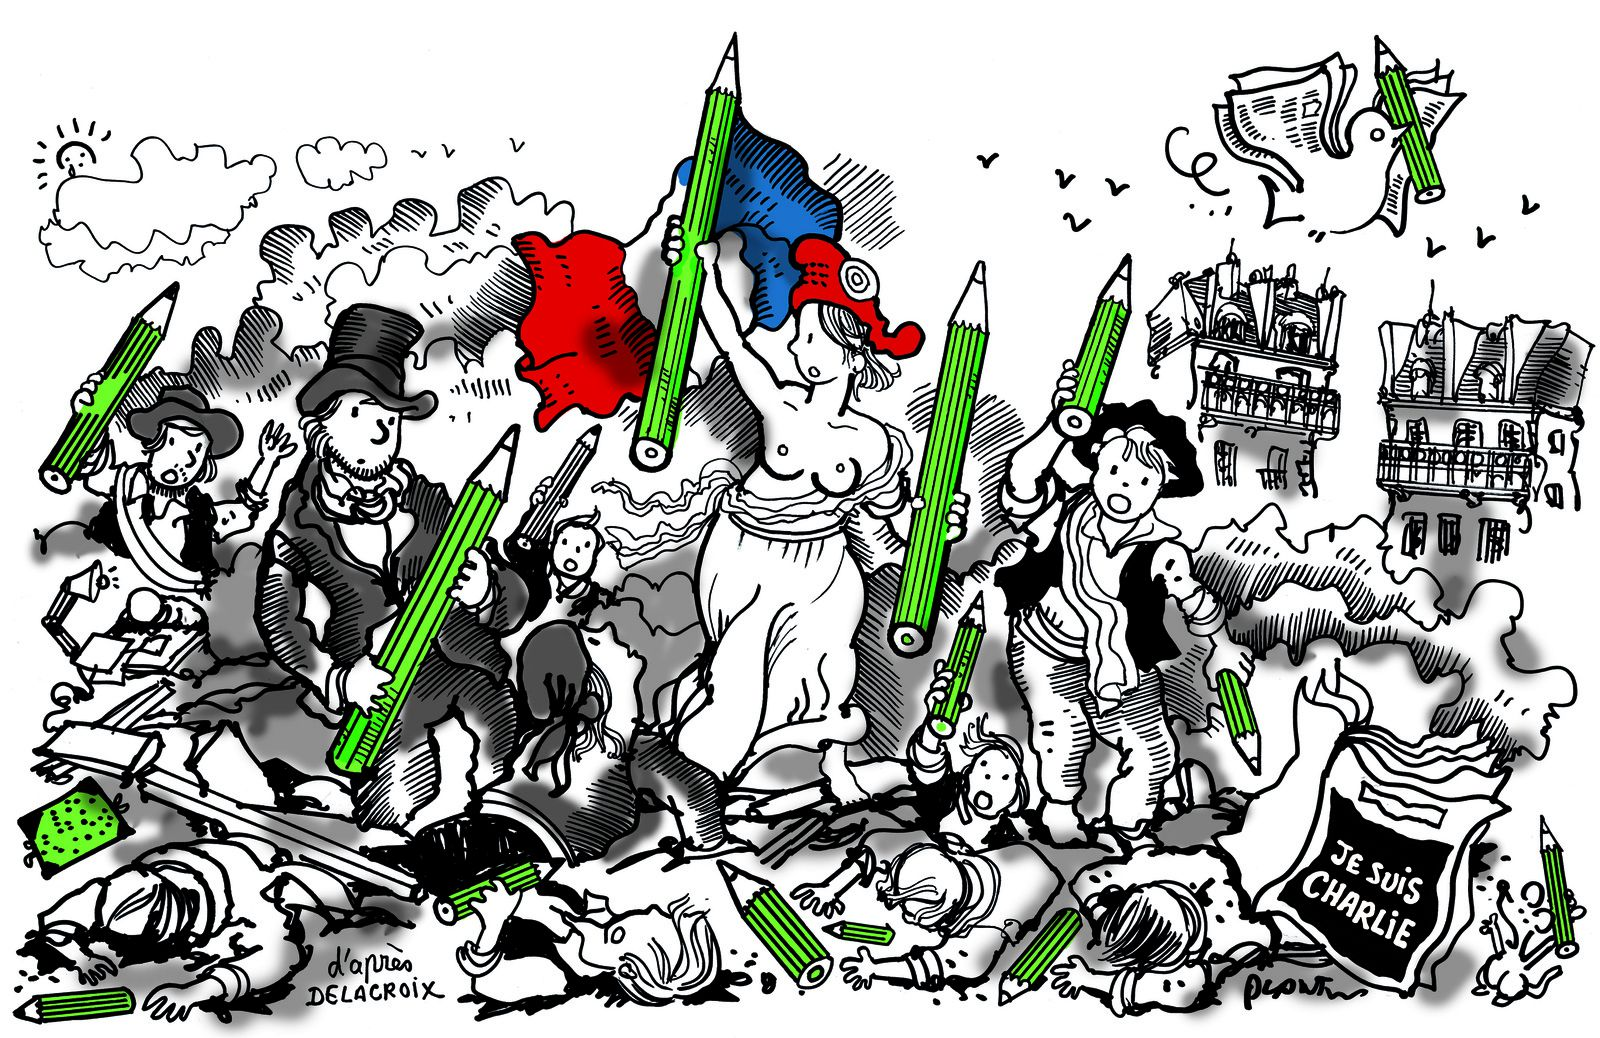 Dessin de Plantu après l'attaque de Charlie Hebdo.